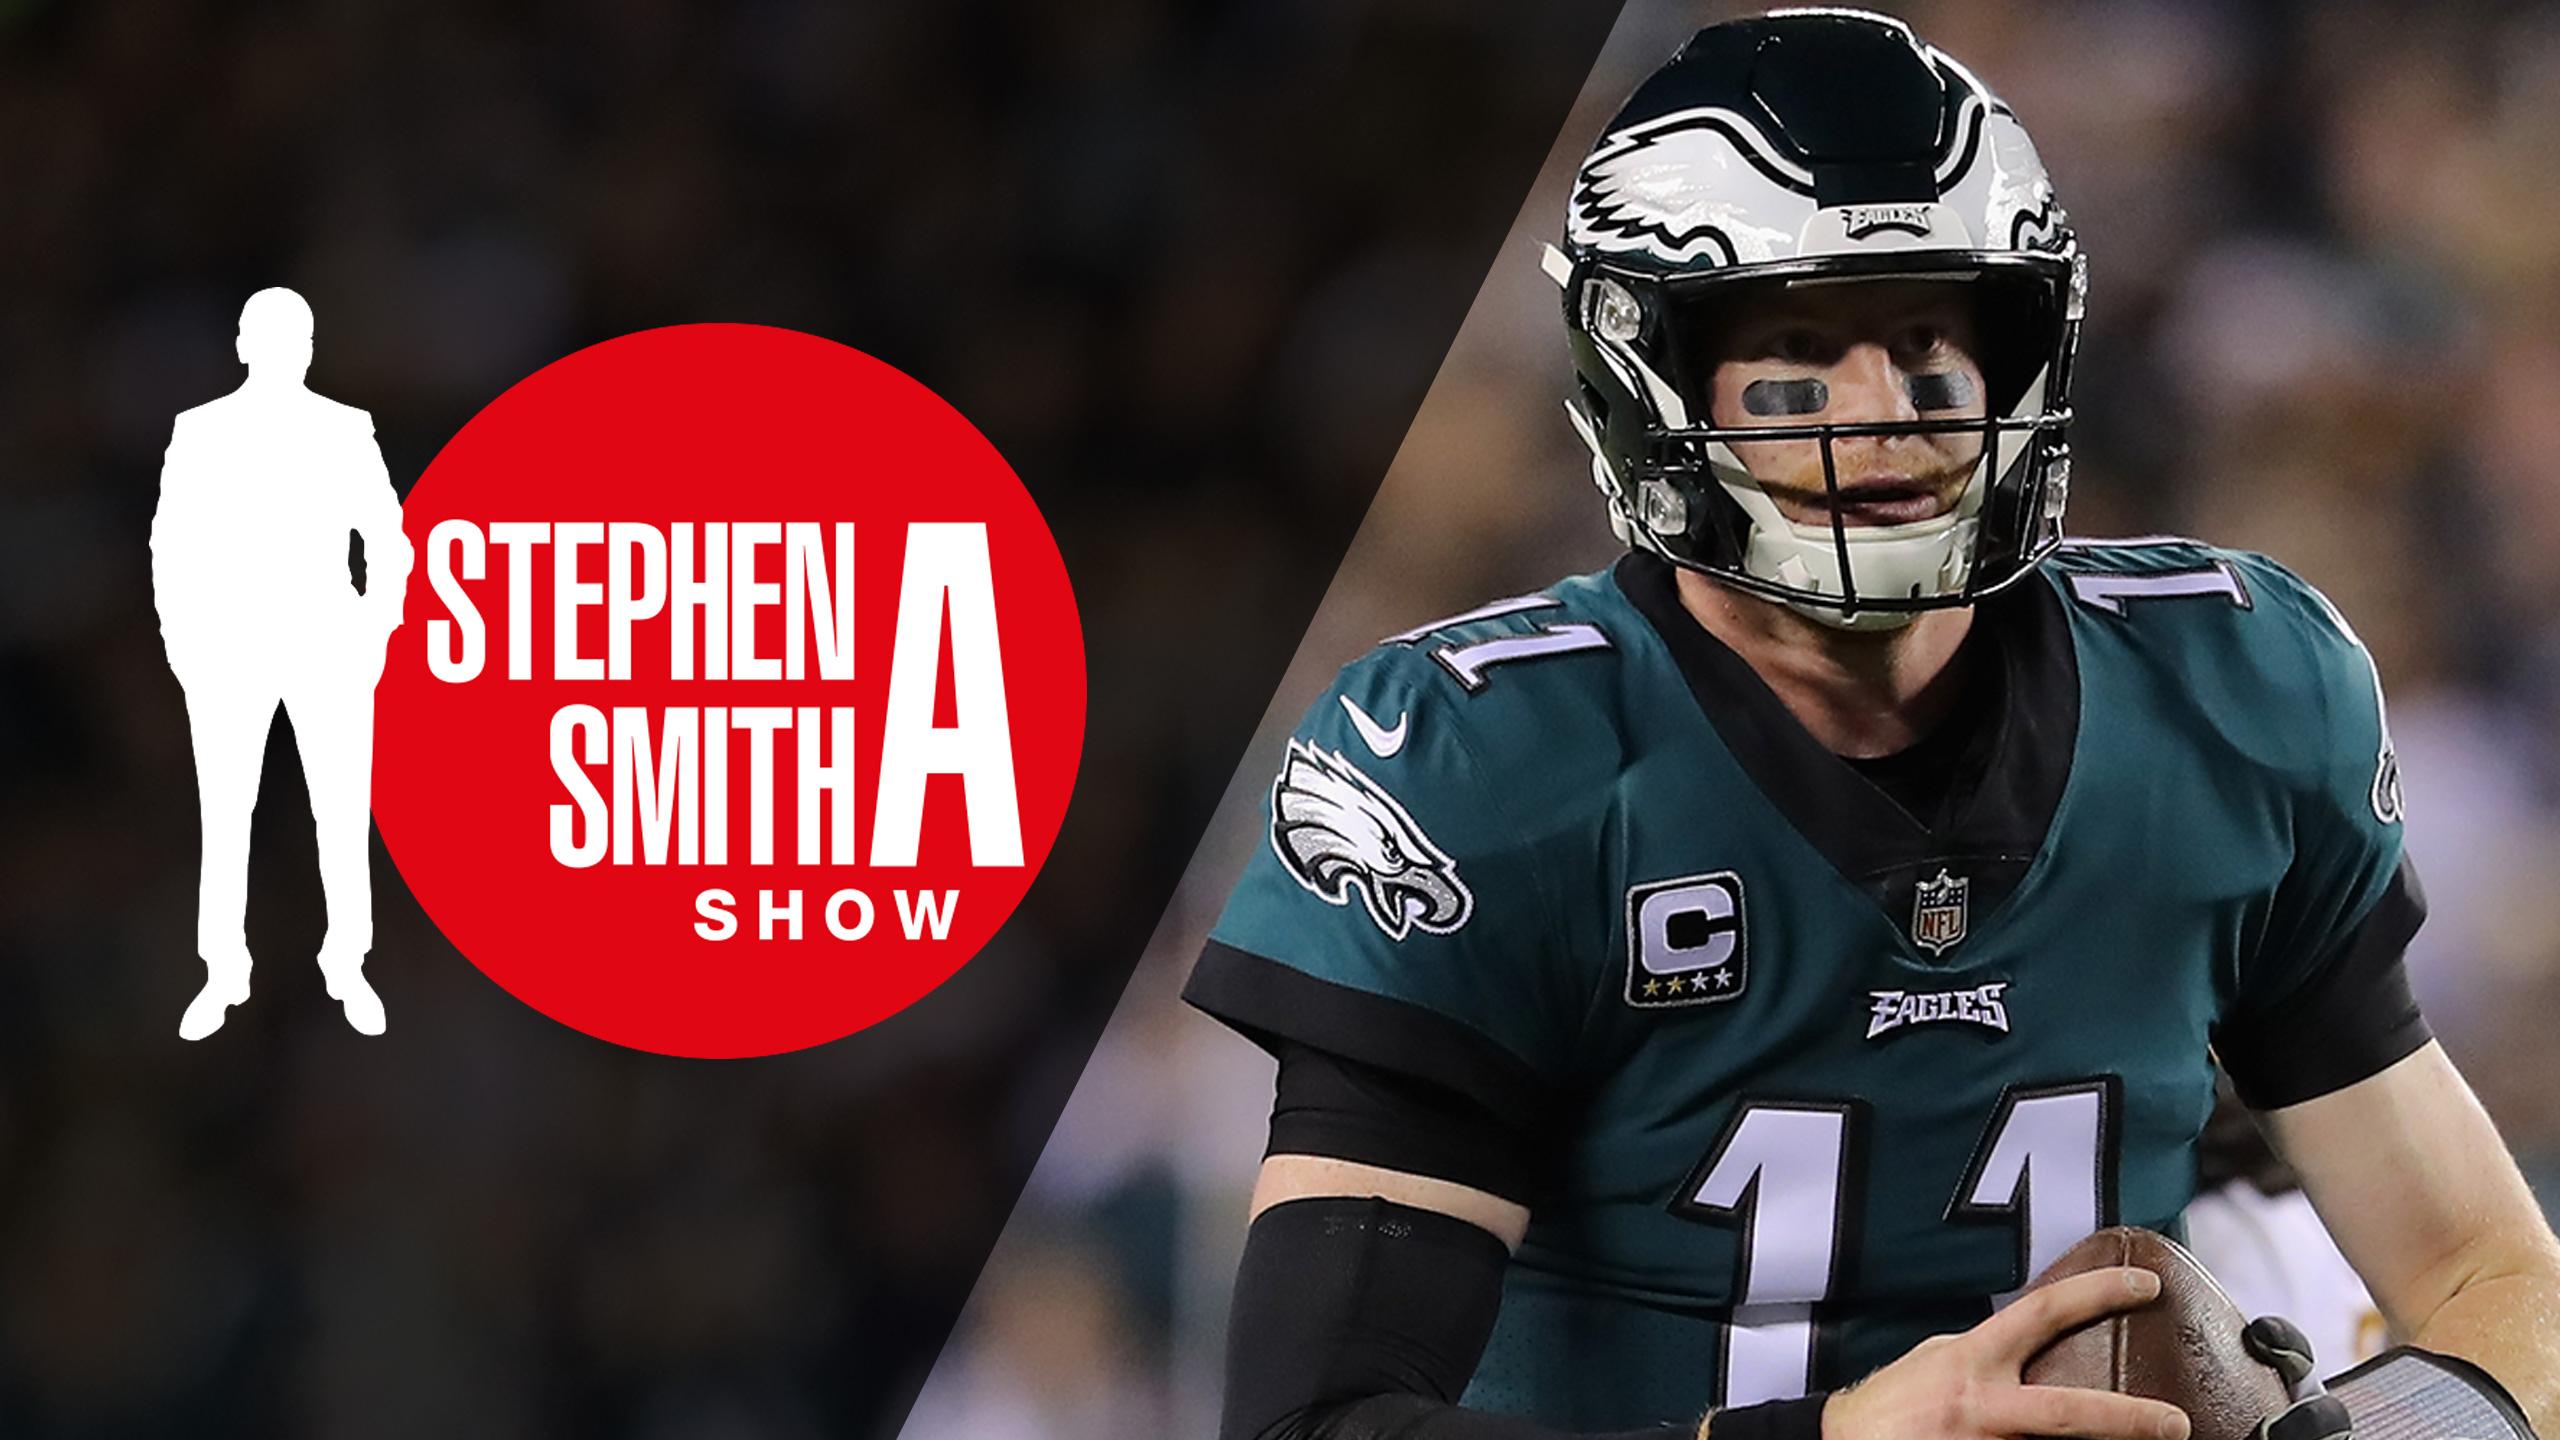 Fri, 12/7 - The Stephen A. Smith Show